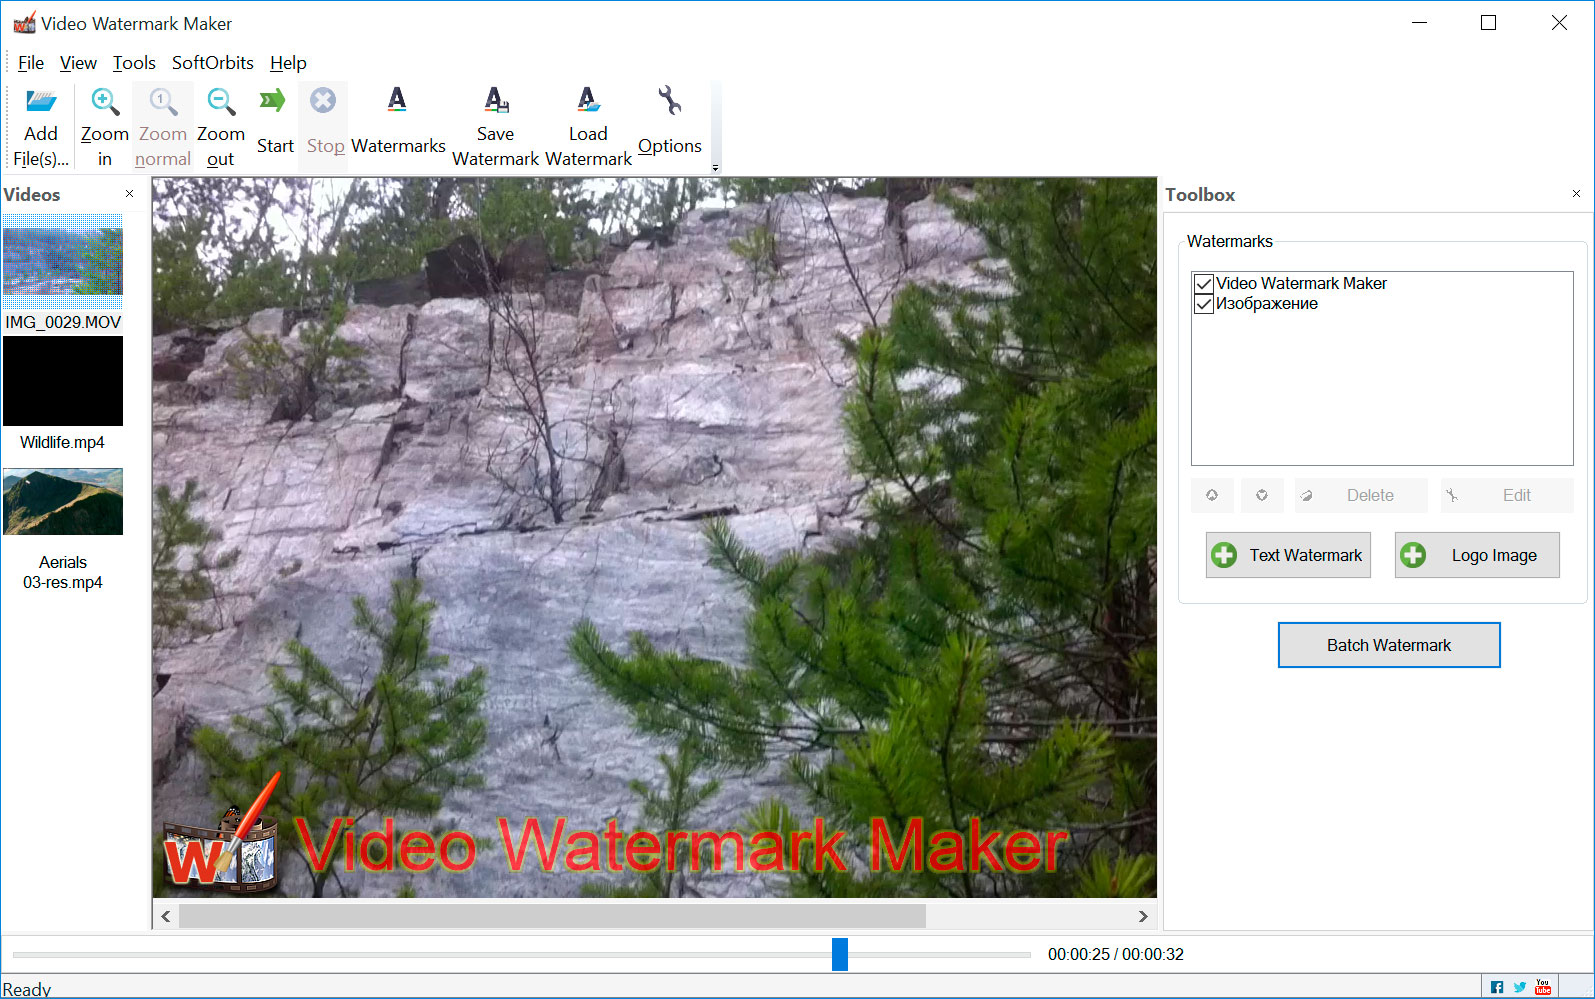 Video Watermark Maker